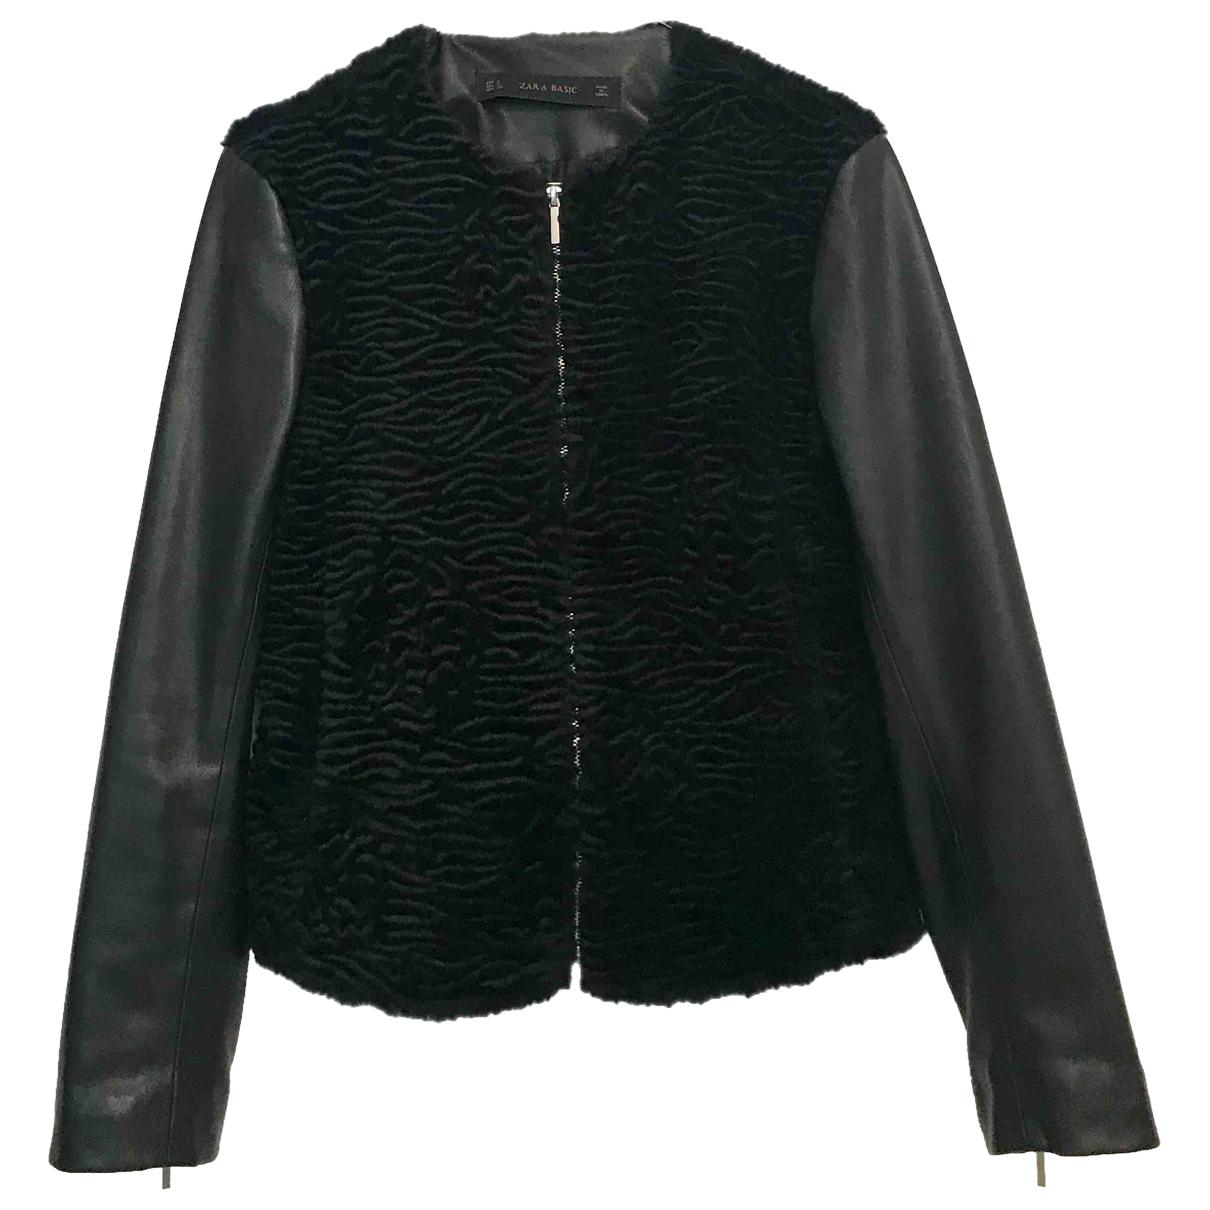 Zara \N Black Leather jacket for Women S International